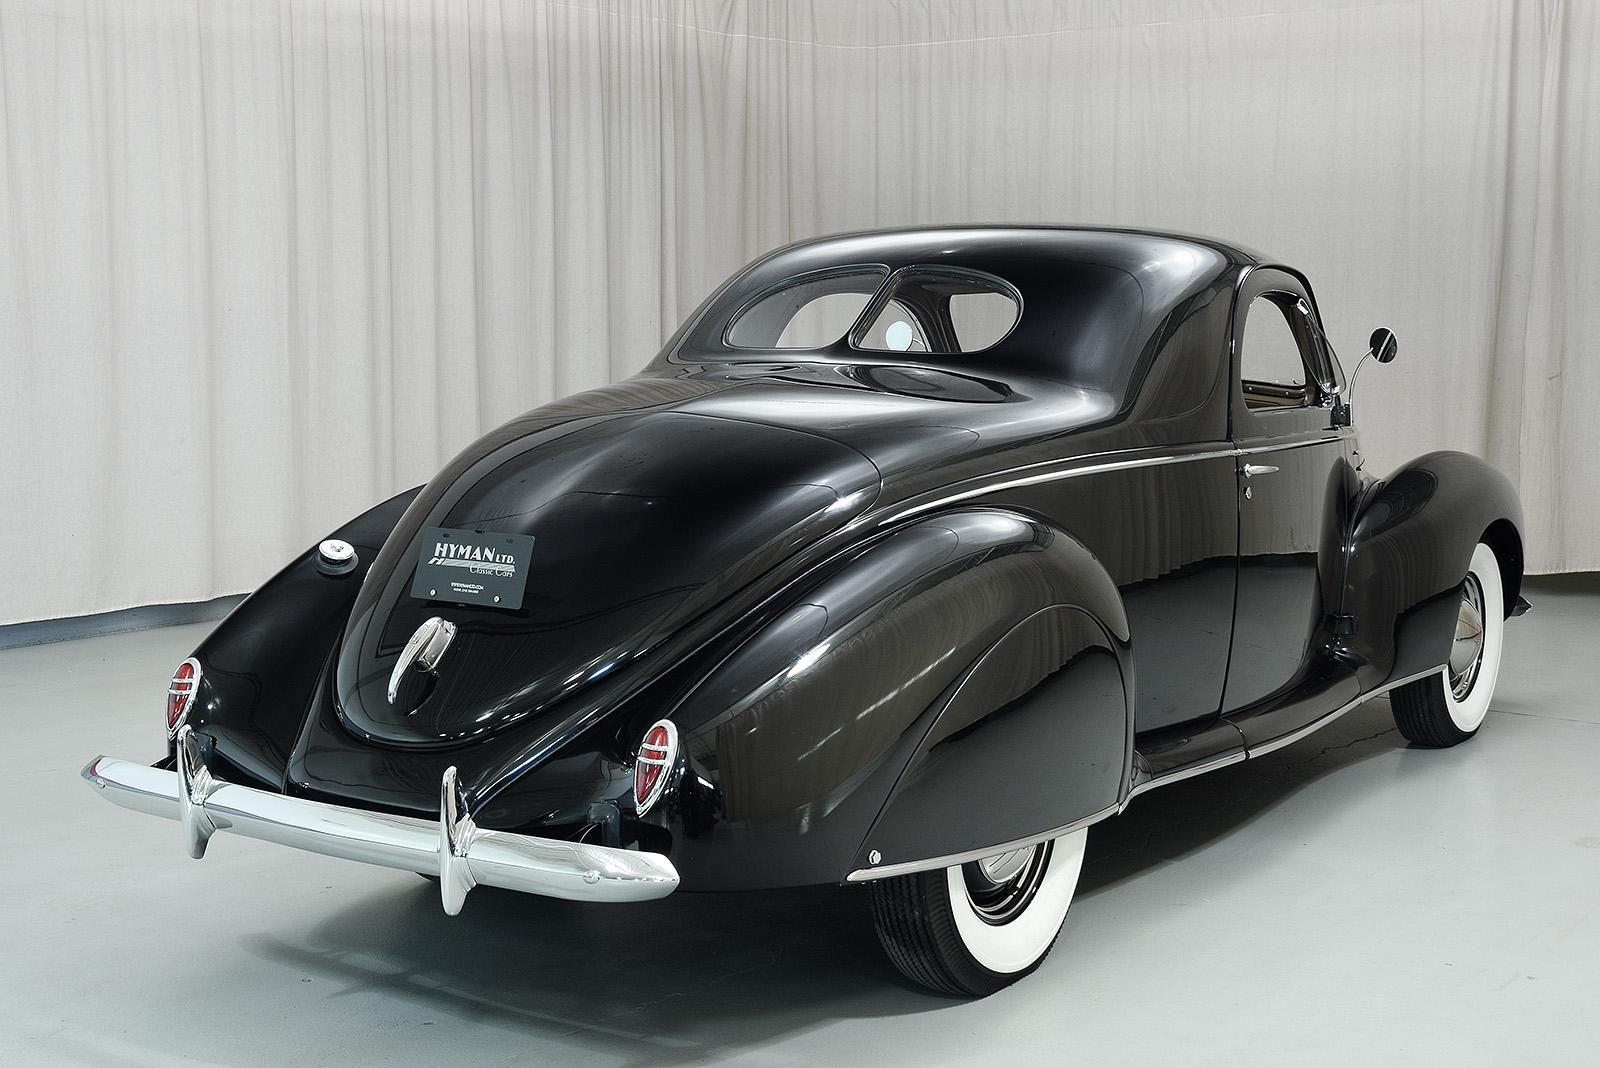 1939 lincoln zephyr coupe hyman ltd classic cars. Black Bedroom Furniture Sets. Home Design Ideas